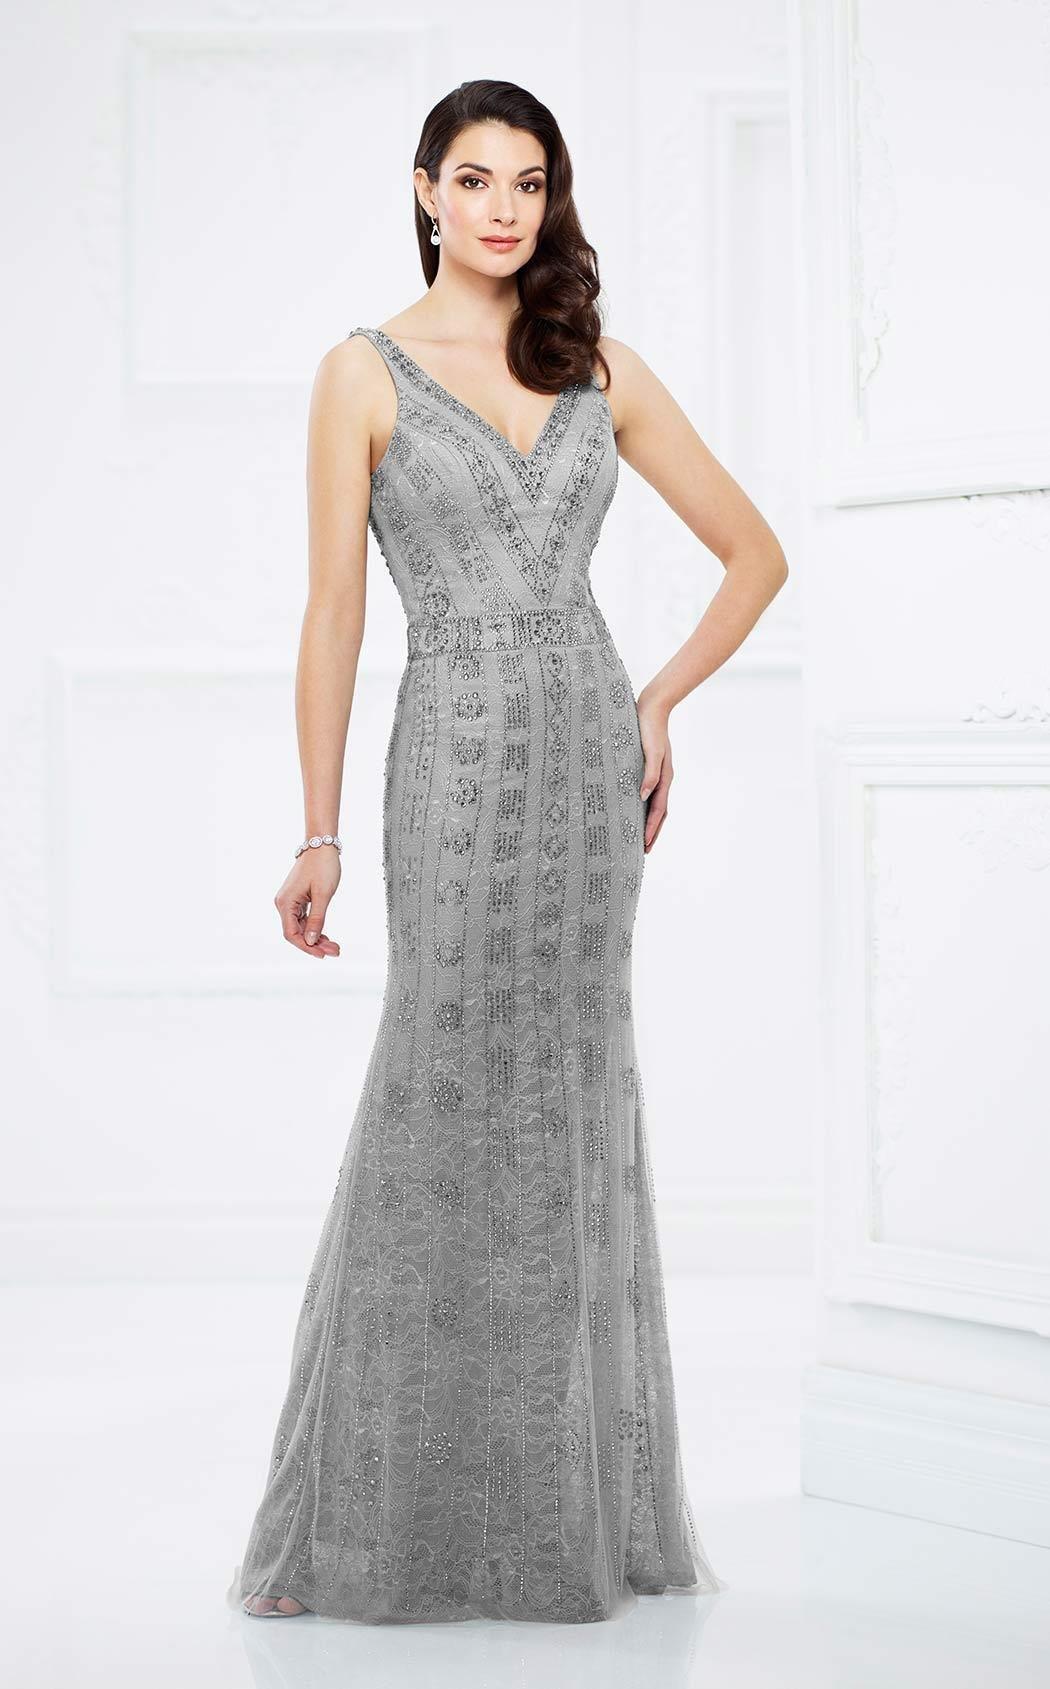 1930s Evening Dress Art Deco Gown Party Dress Mother Of The Bride Dresses Evening Dress Fashion Dresses [ 1689 x 1050 Pixel ]